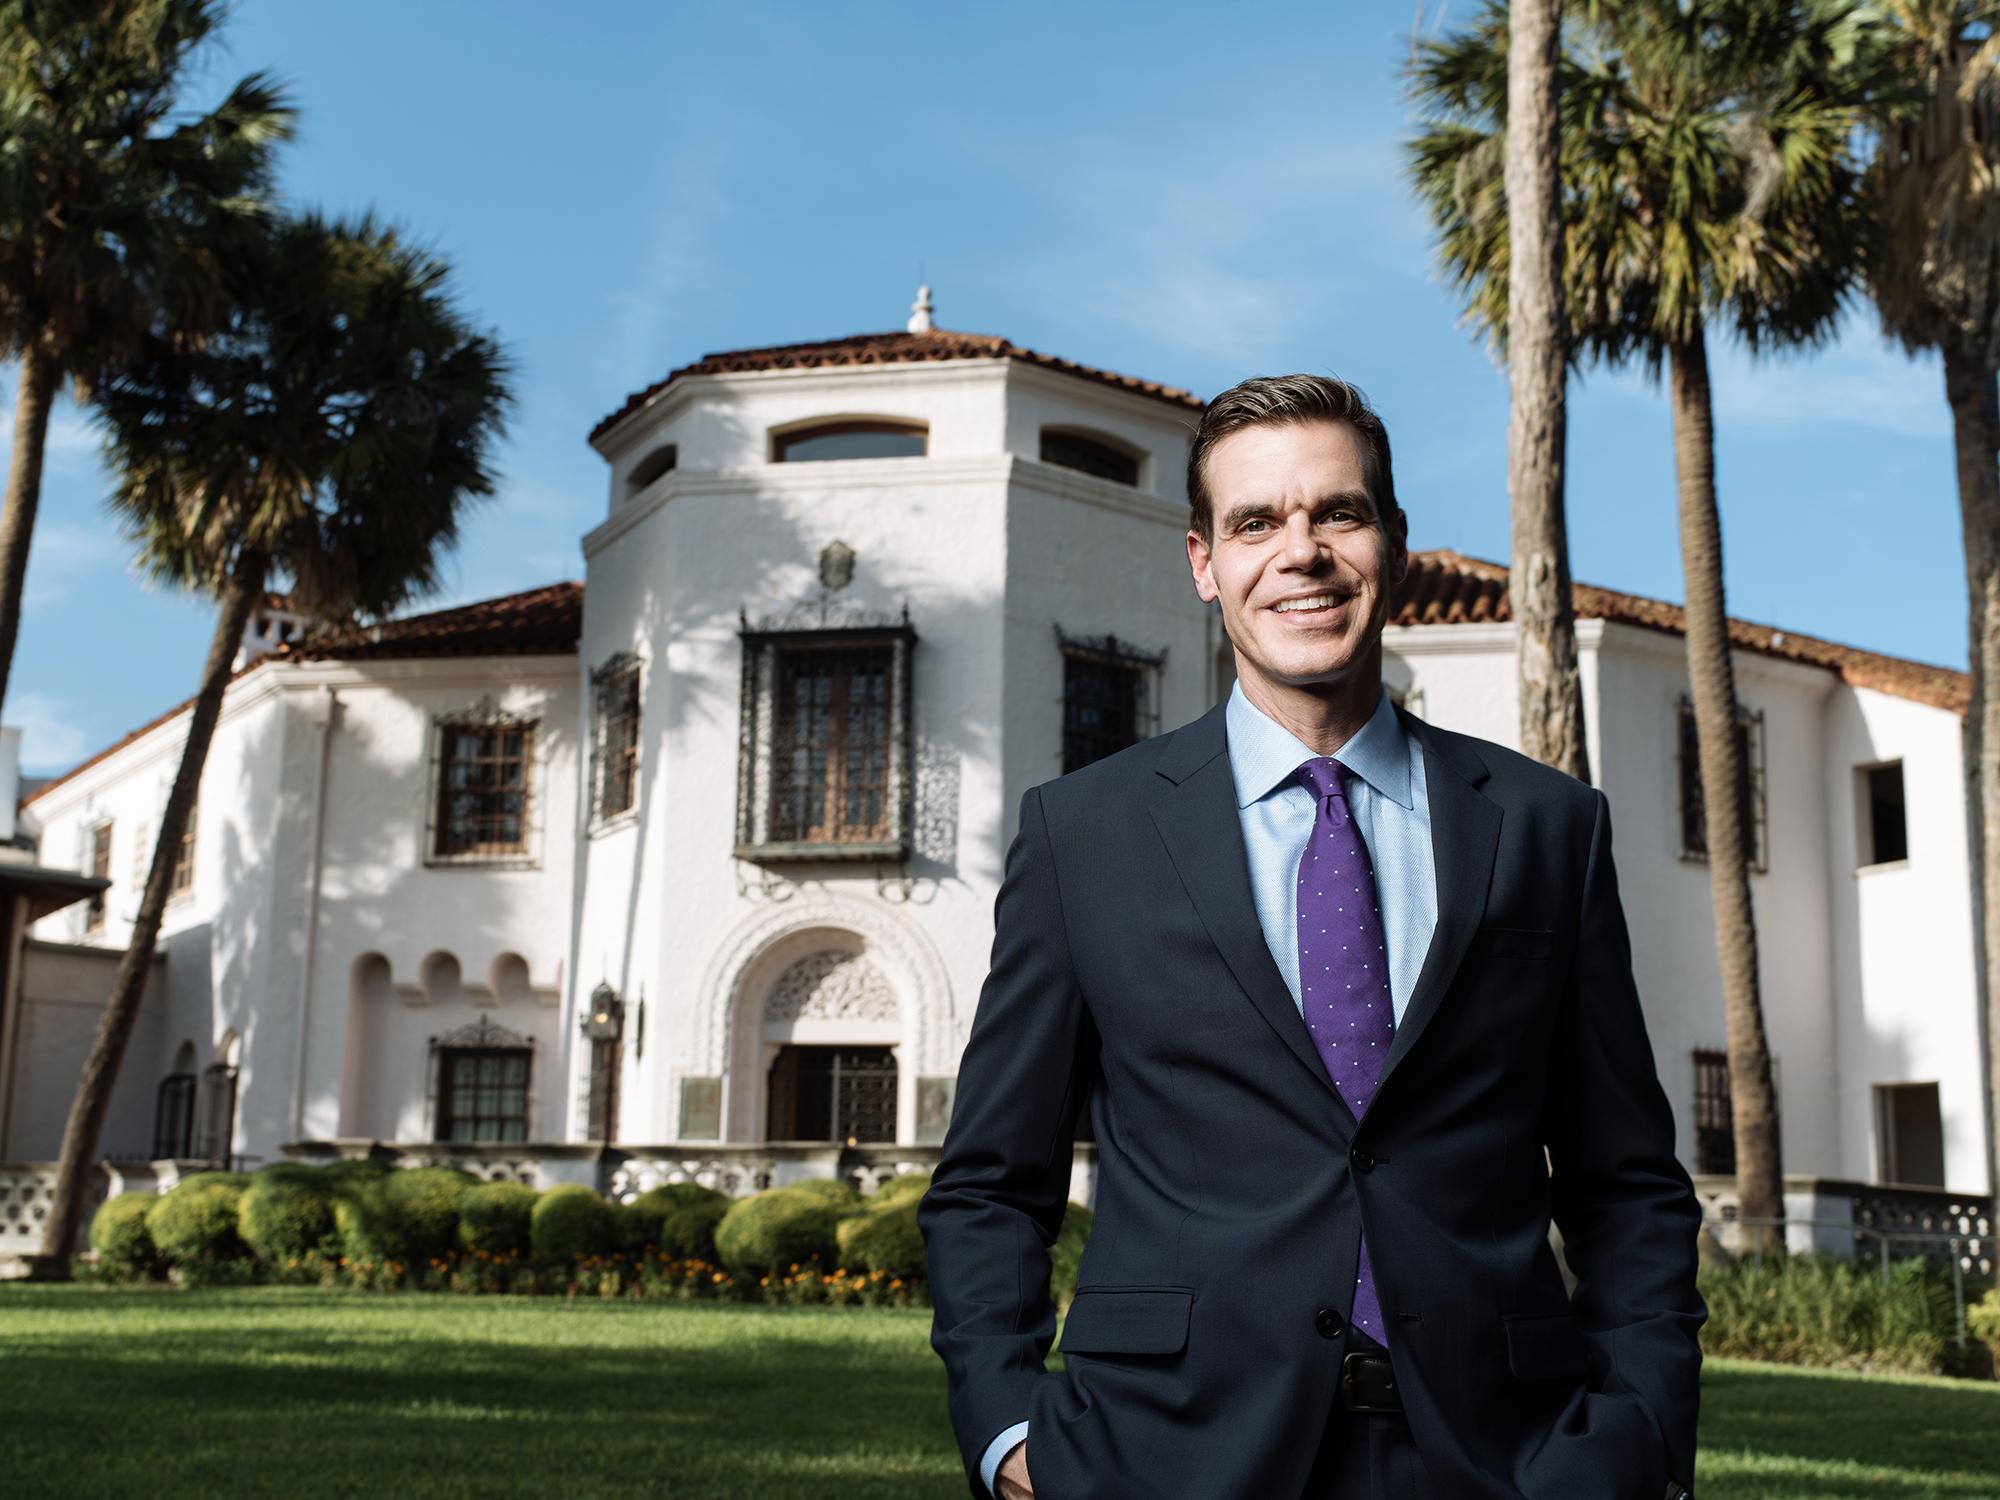 Richard Aste is the Recipient of the Harvard Business School Club of San Antonio School